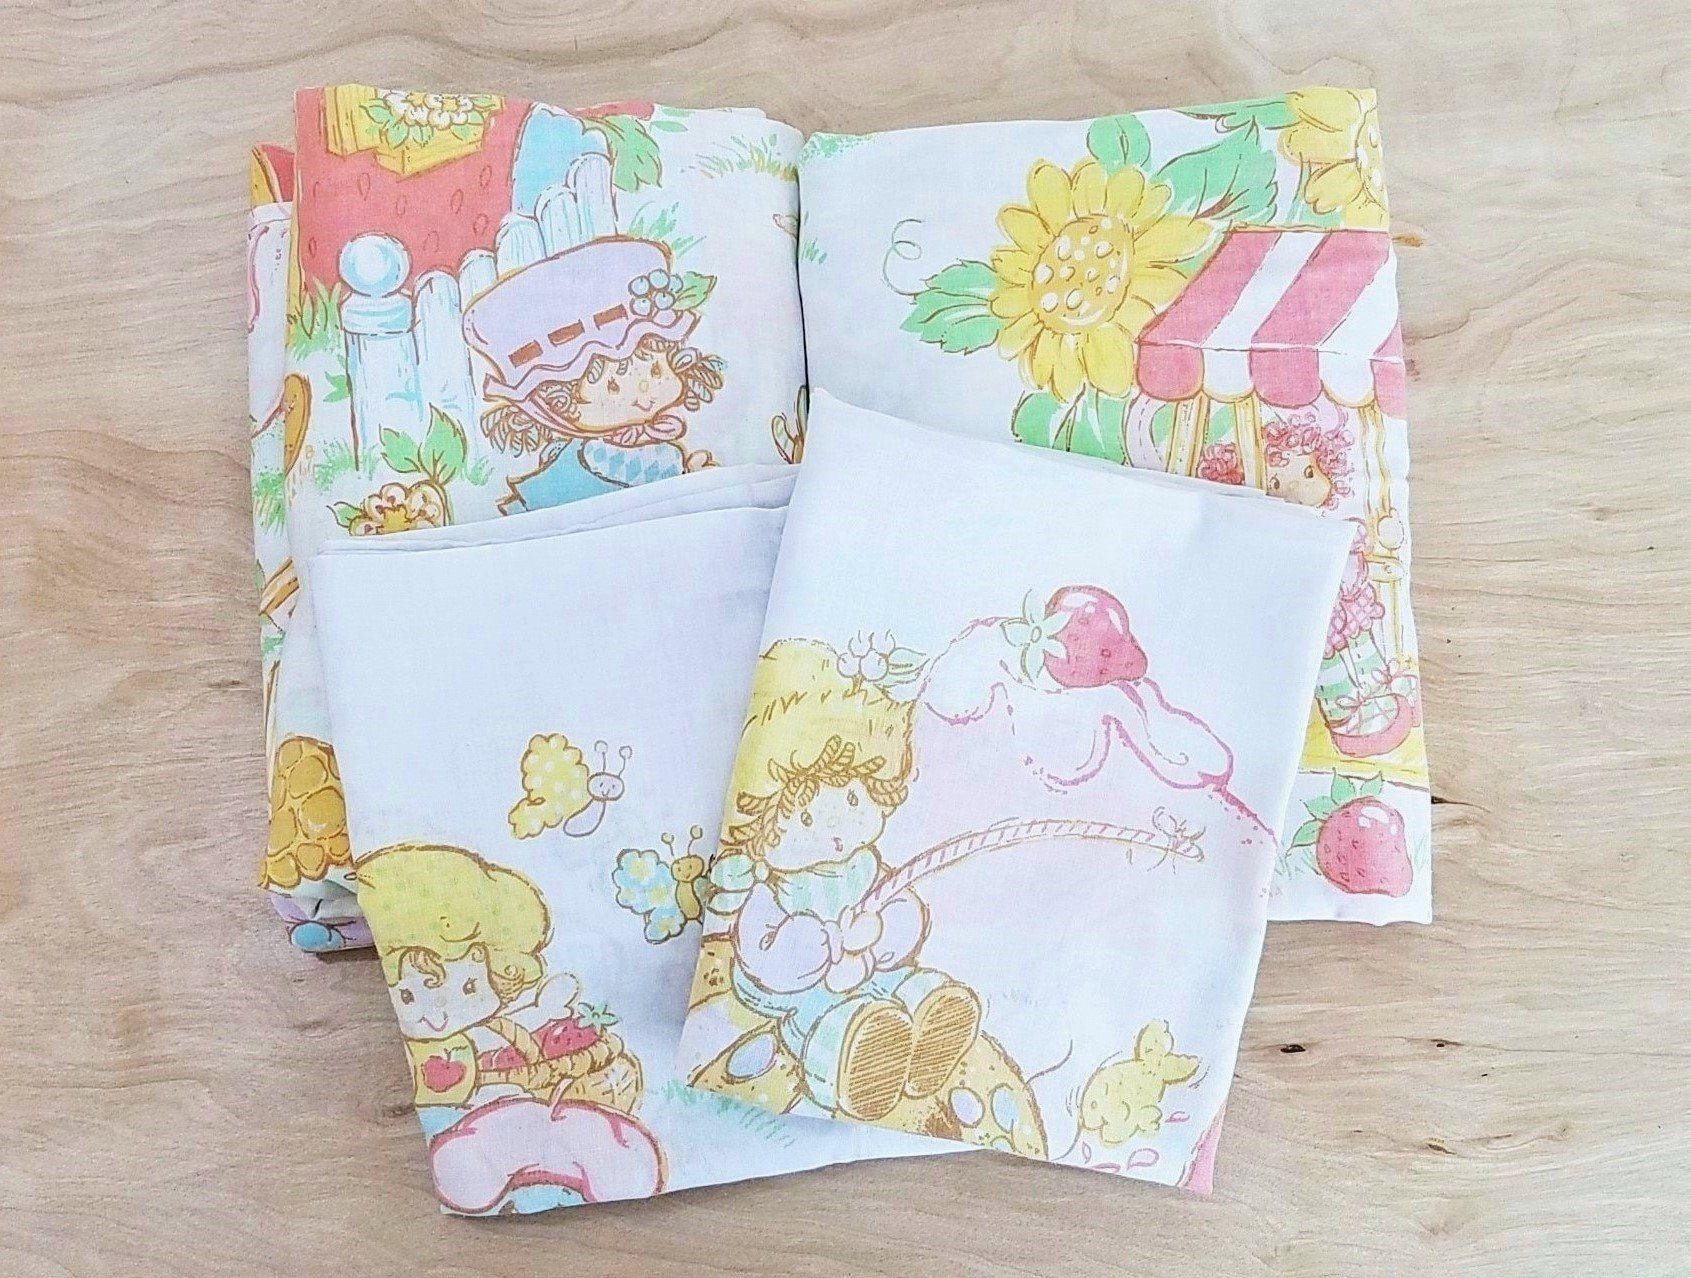 vintage strawberry shortcake sheet set full size sheets children's